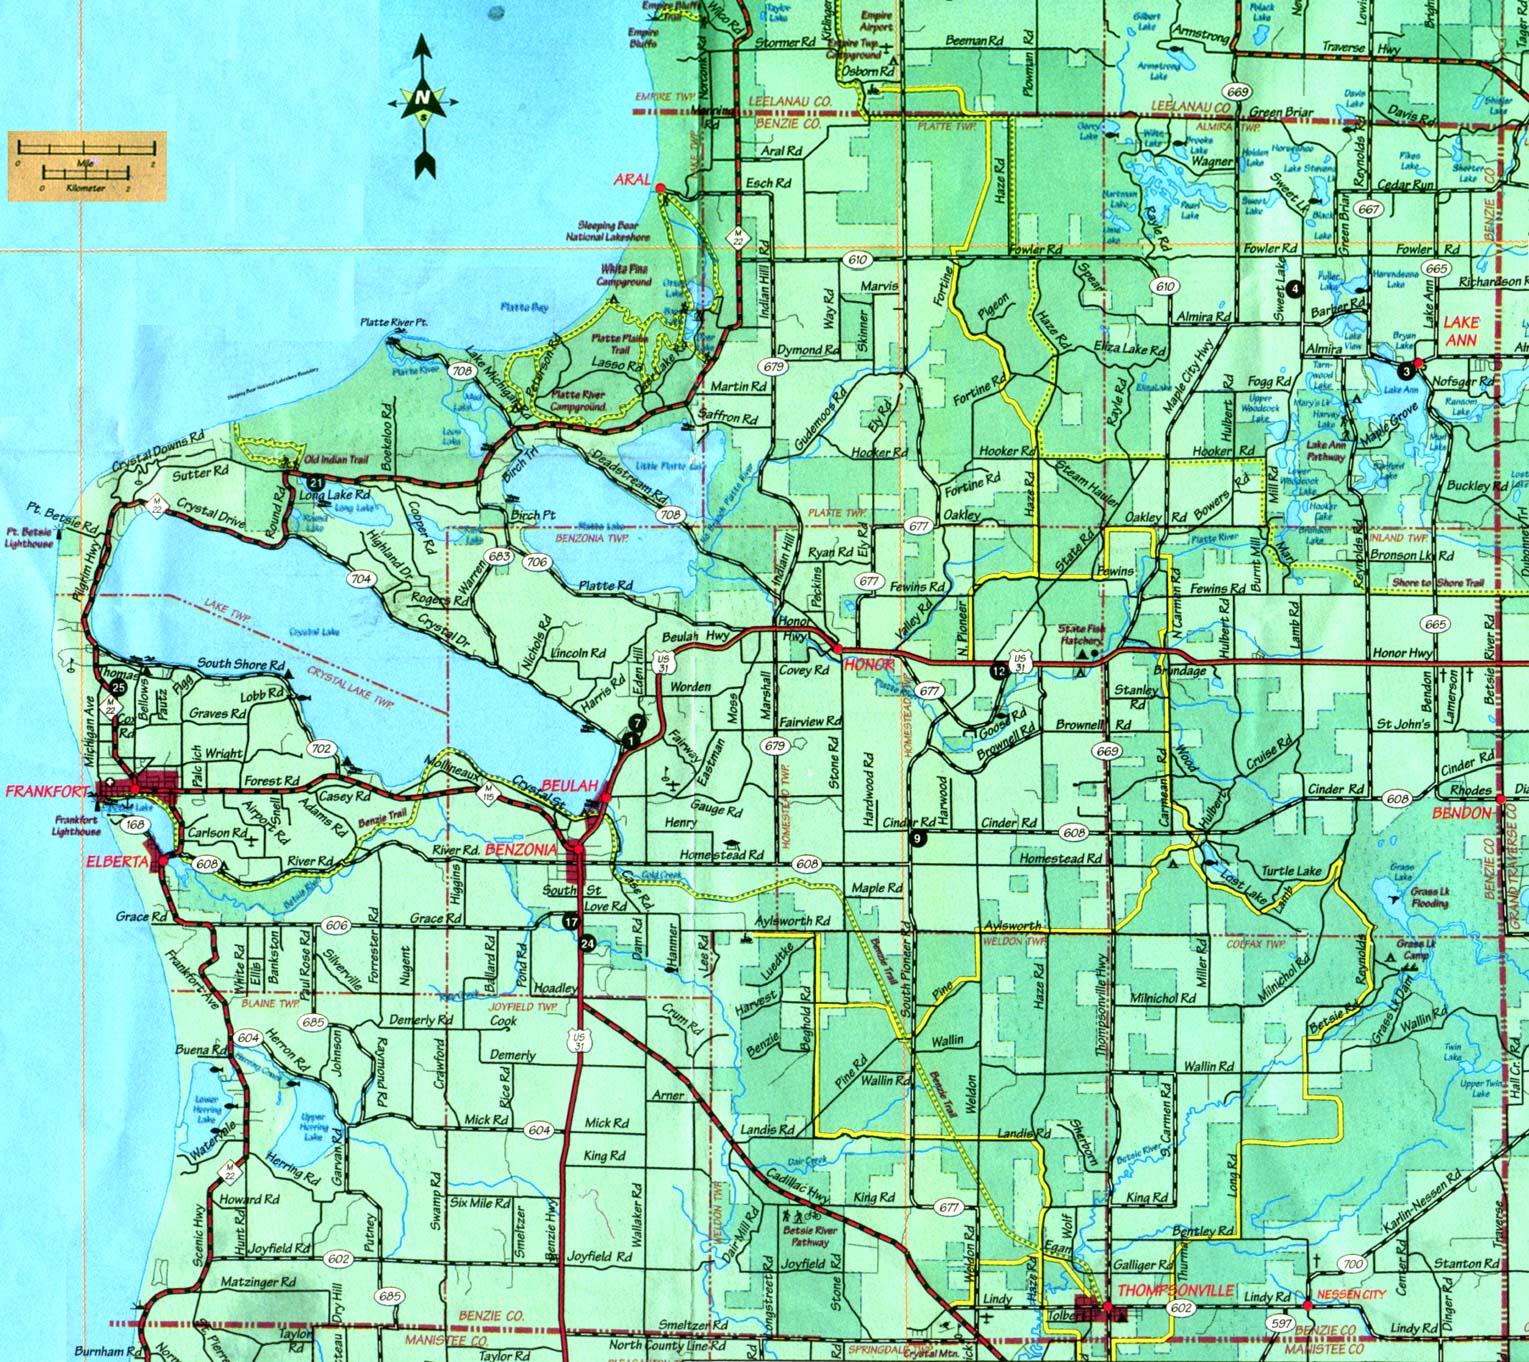 benzie county michigan map Wallpaper Downloads 1529x1362